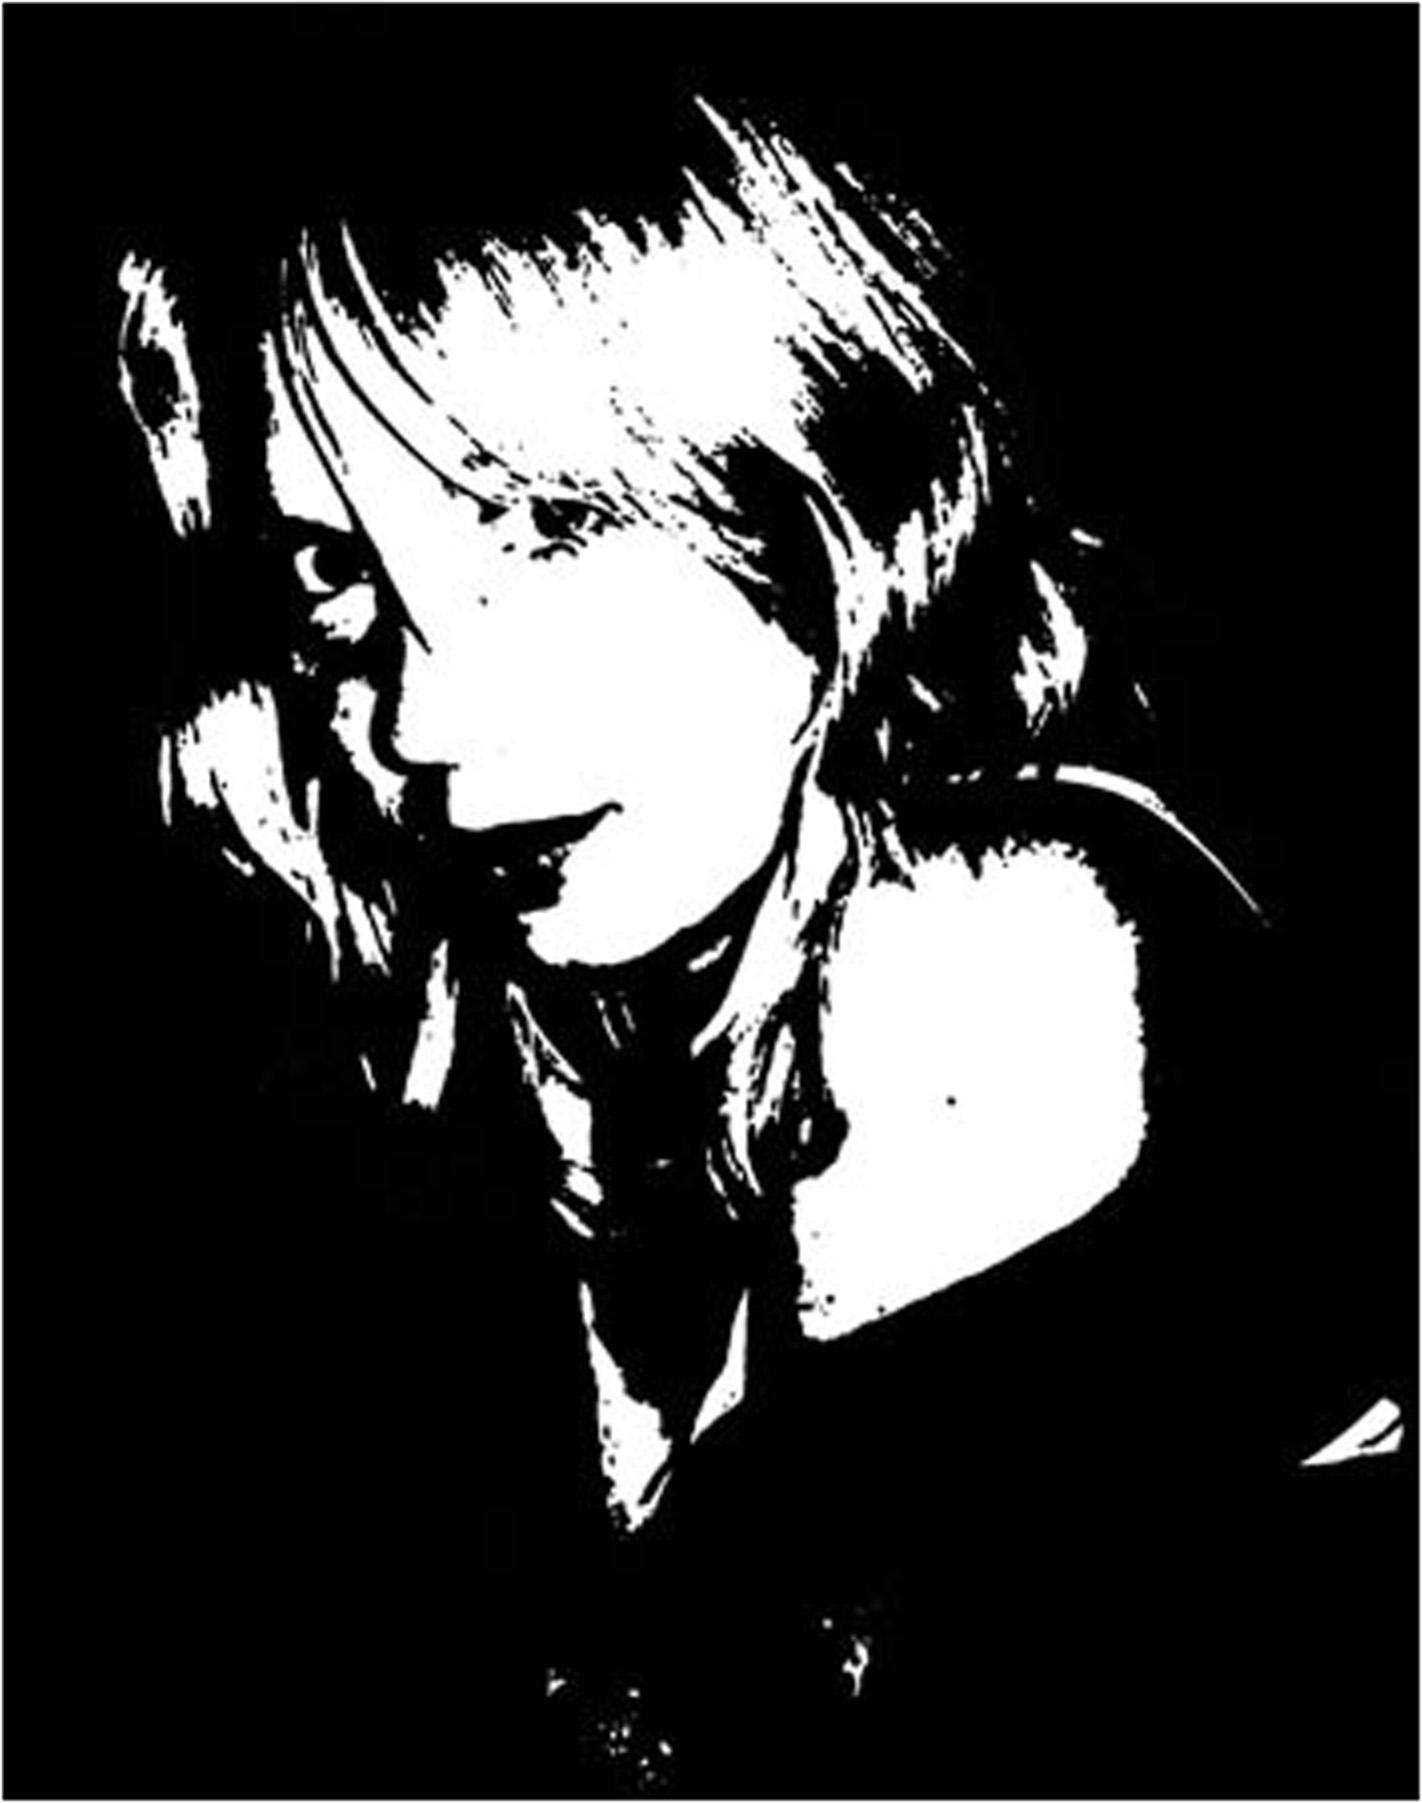 zwart wit foto zeefdruk